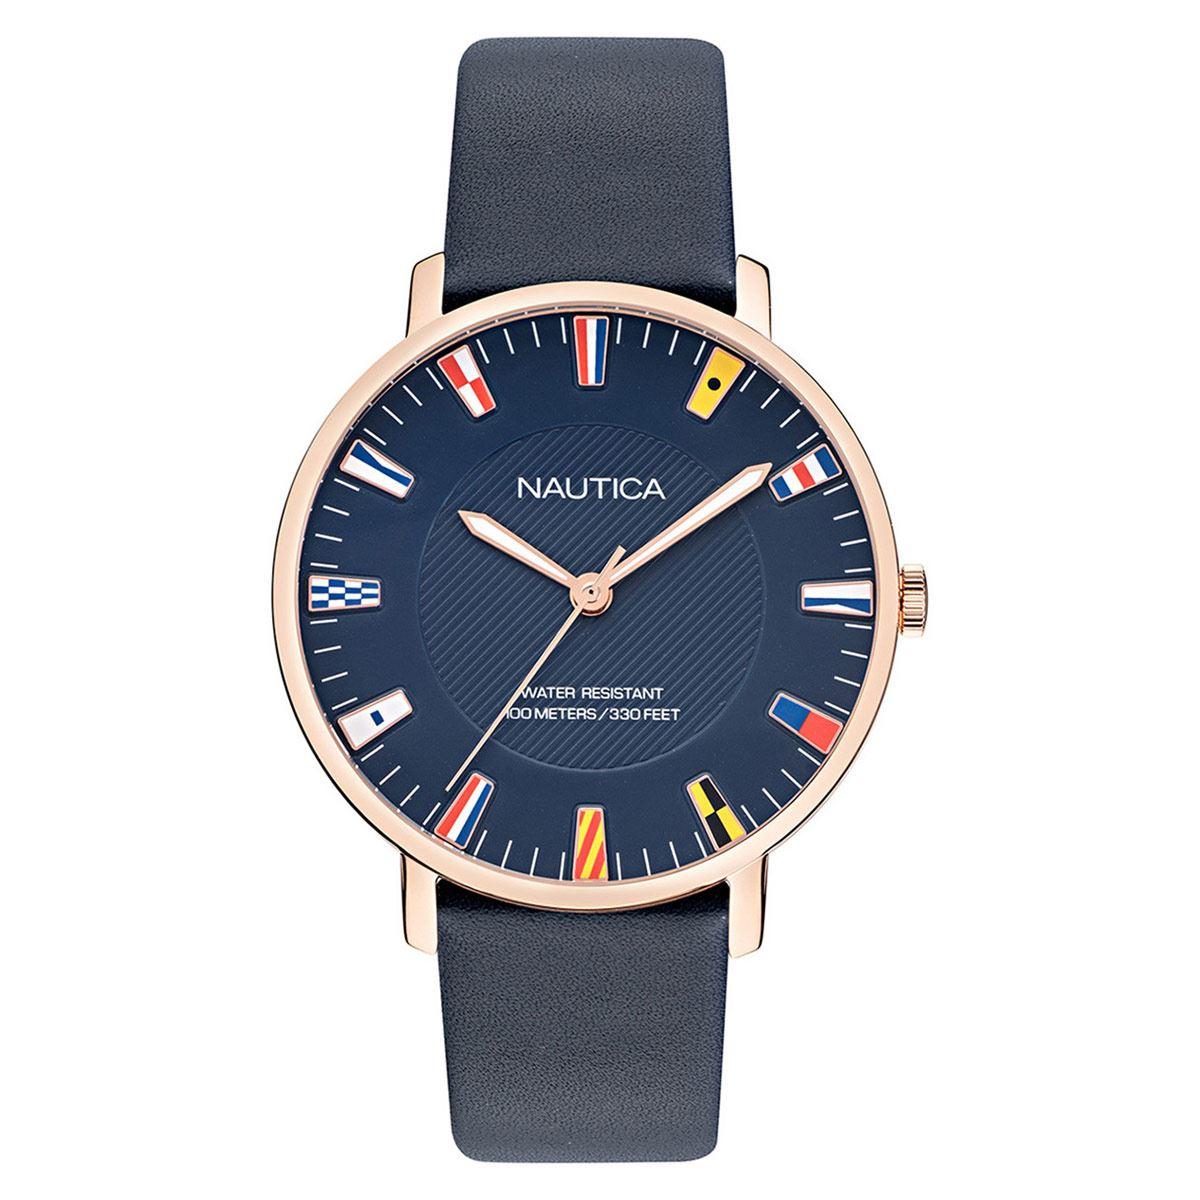 Reloj Nautica Azul Navy NAPCRF907